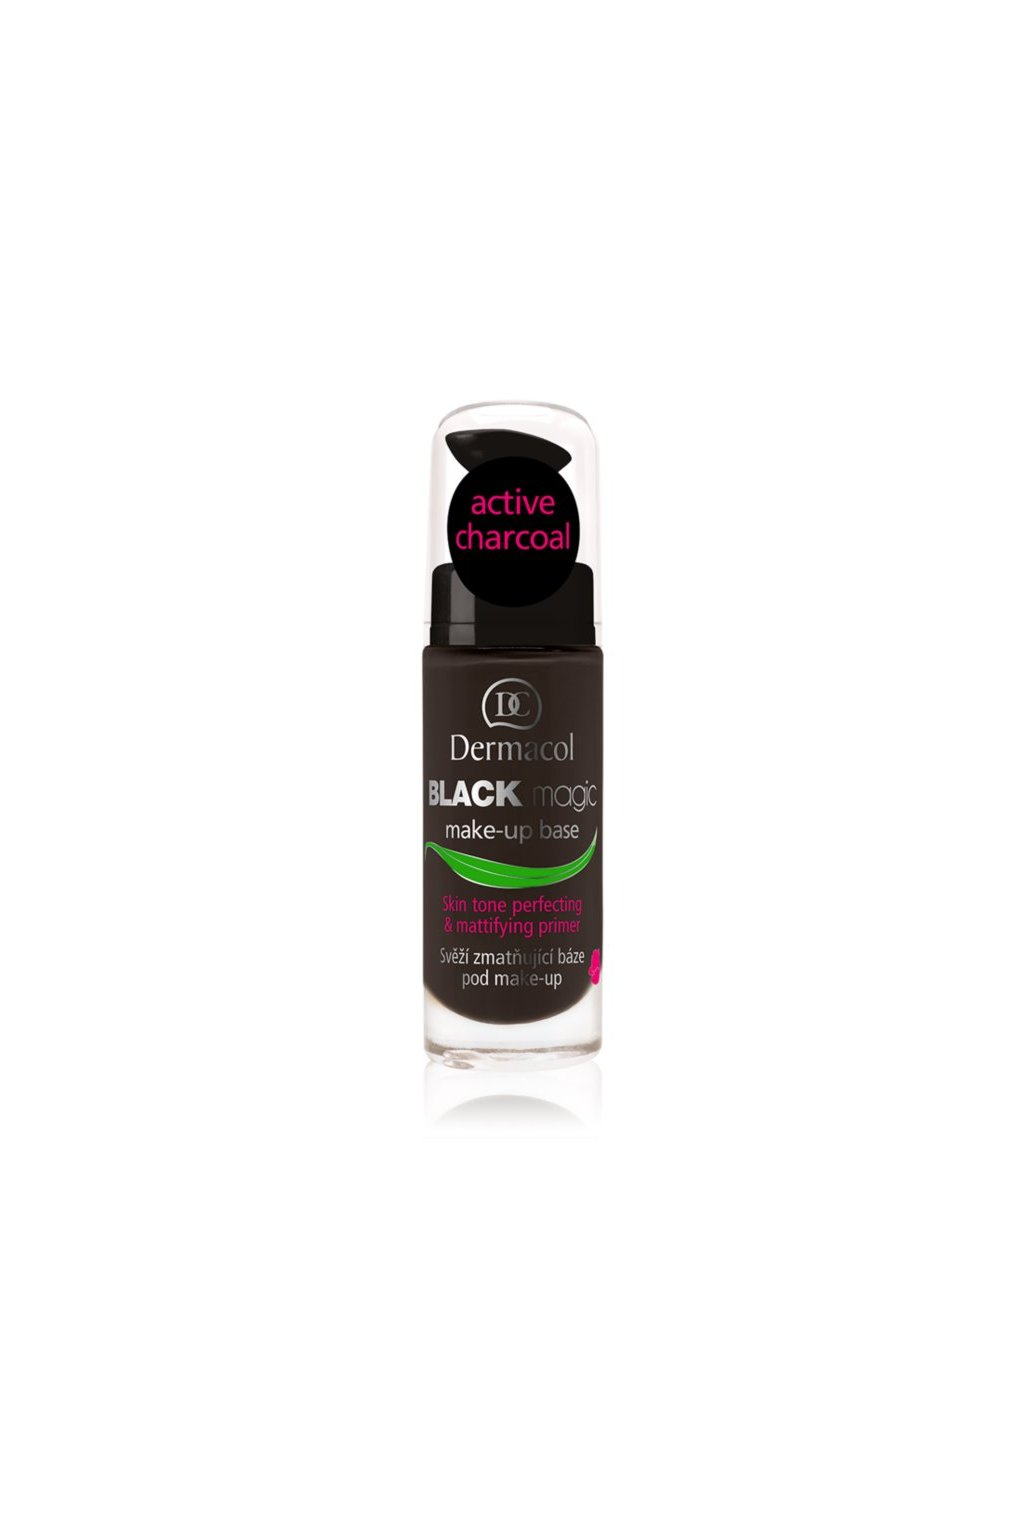 dermacol black magic zmatnujici baze pod make up 1